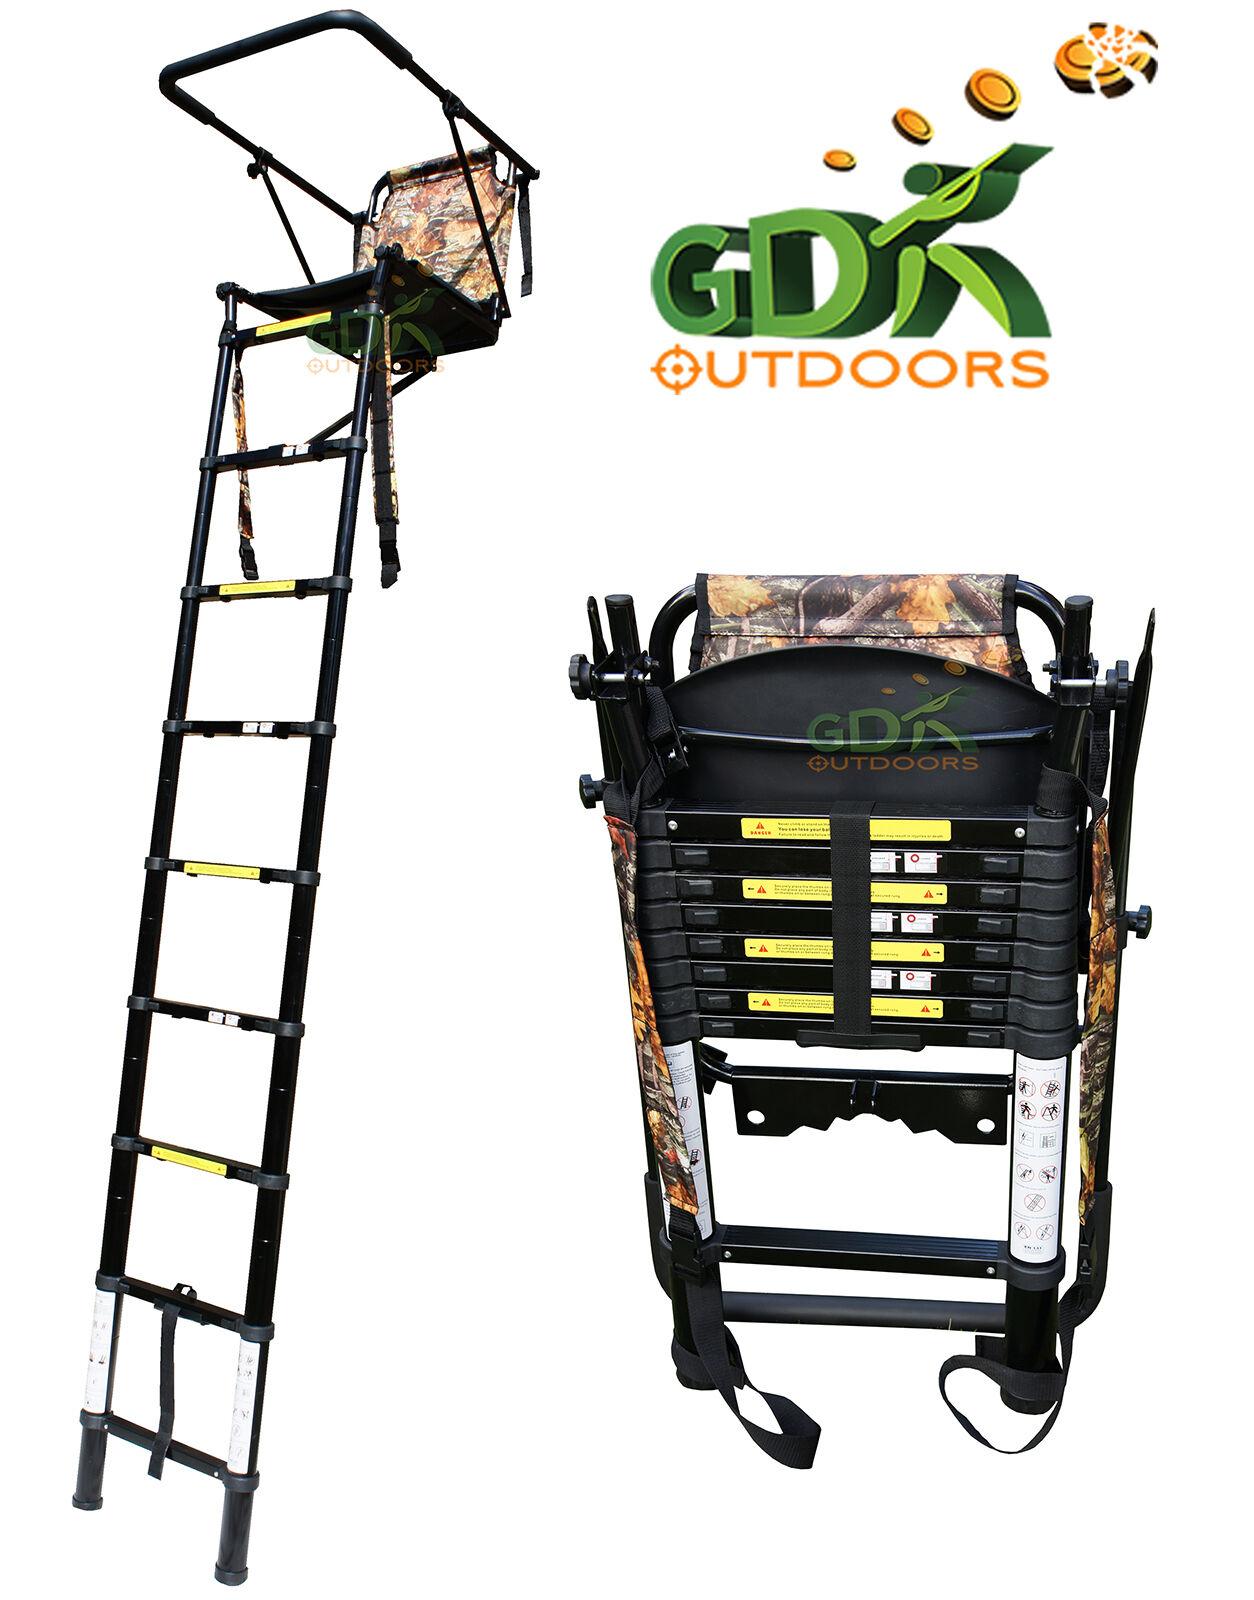 Gdk 2 5m Telescopic High Tree Ladder High Seat Folding